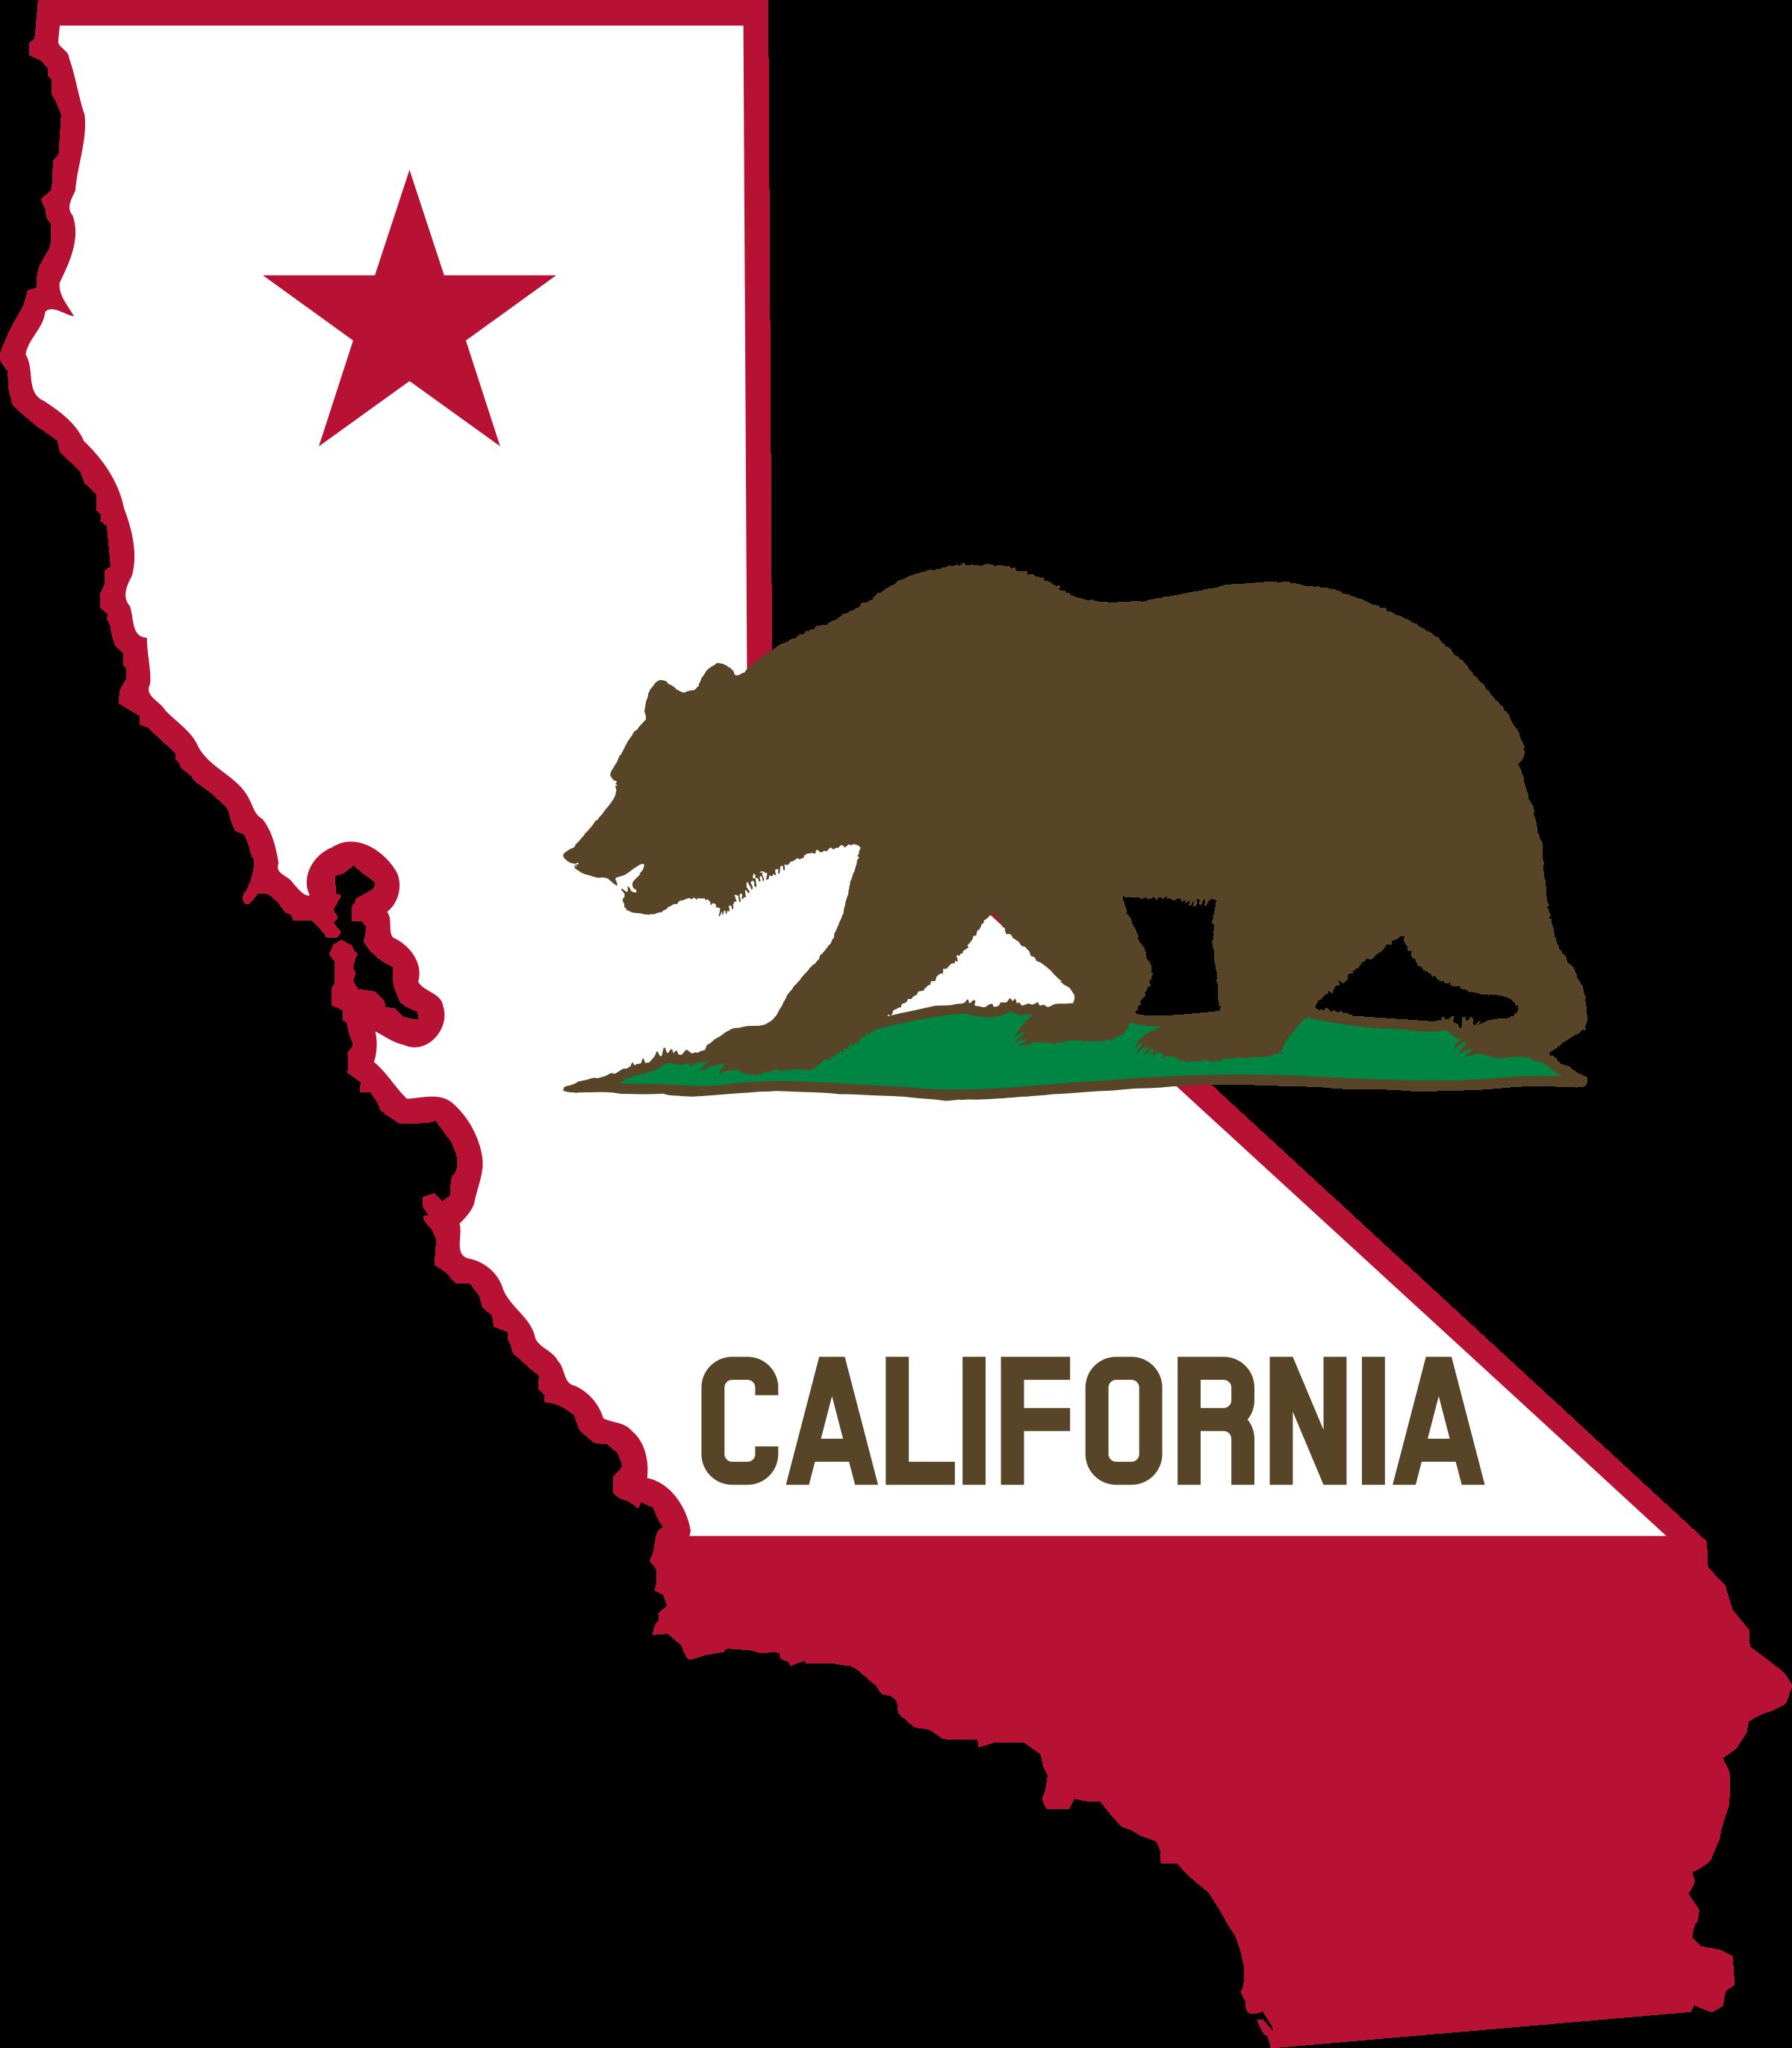 Clipart map of california svg transparent library Solid Map Of California Clip Art - ClipArt Best svg transparent library